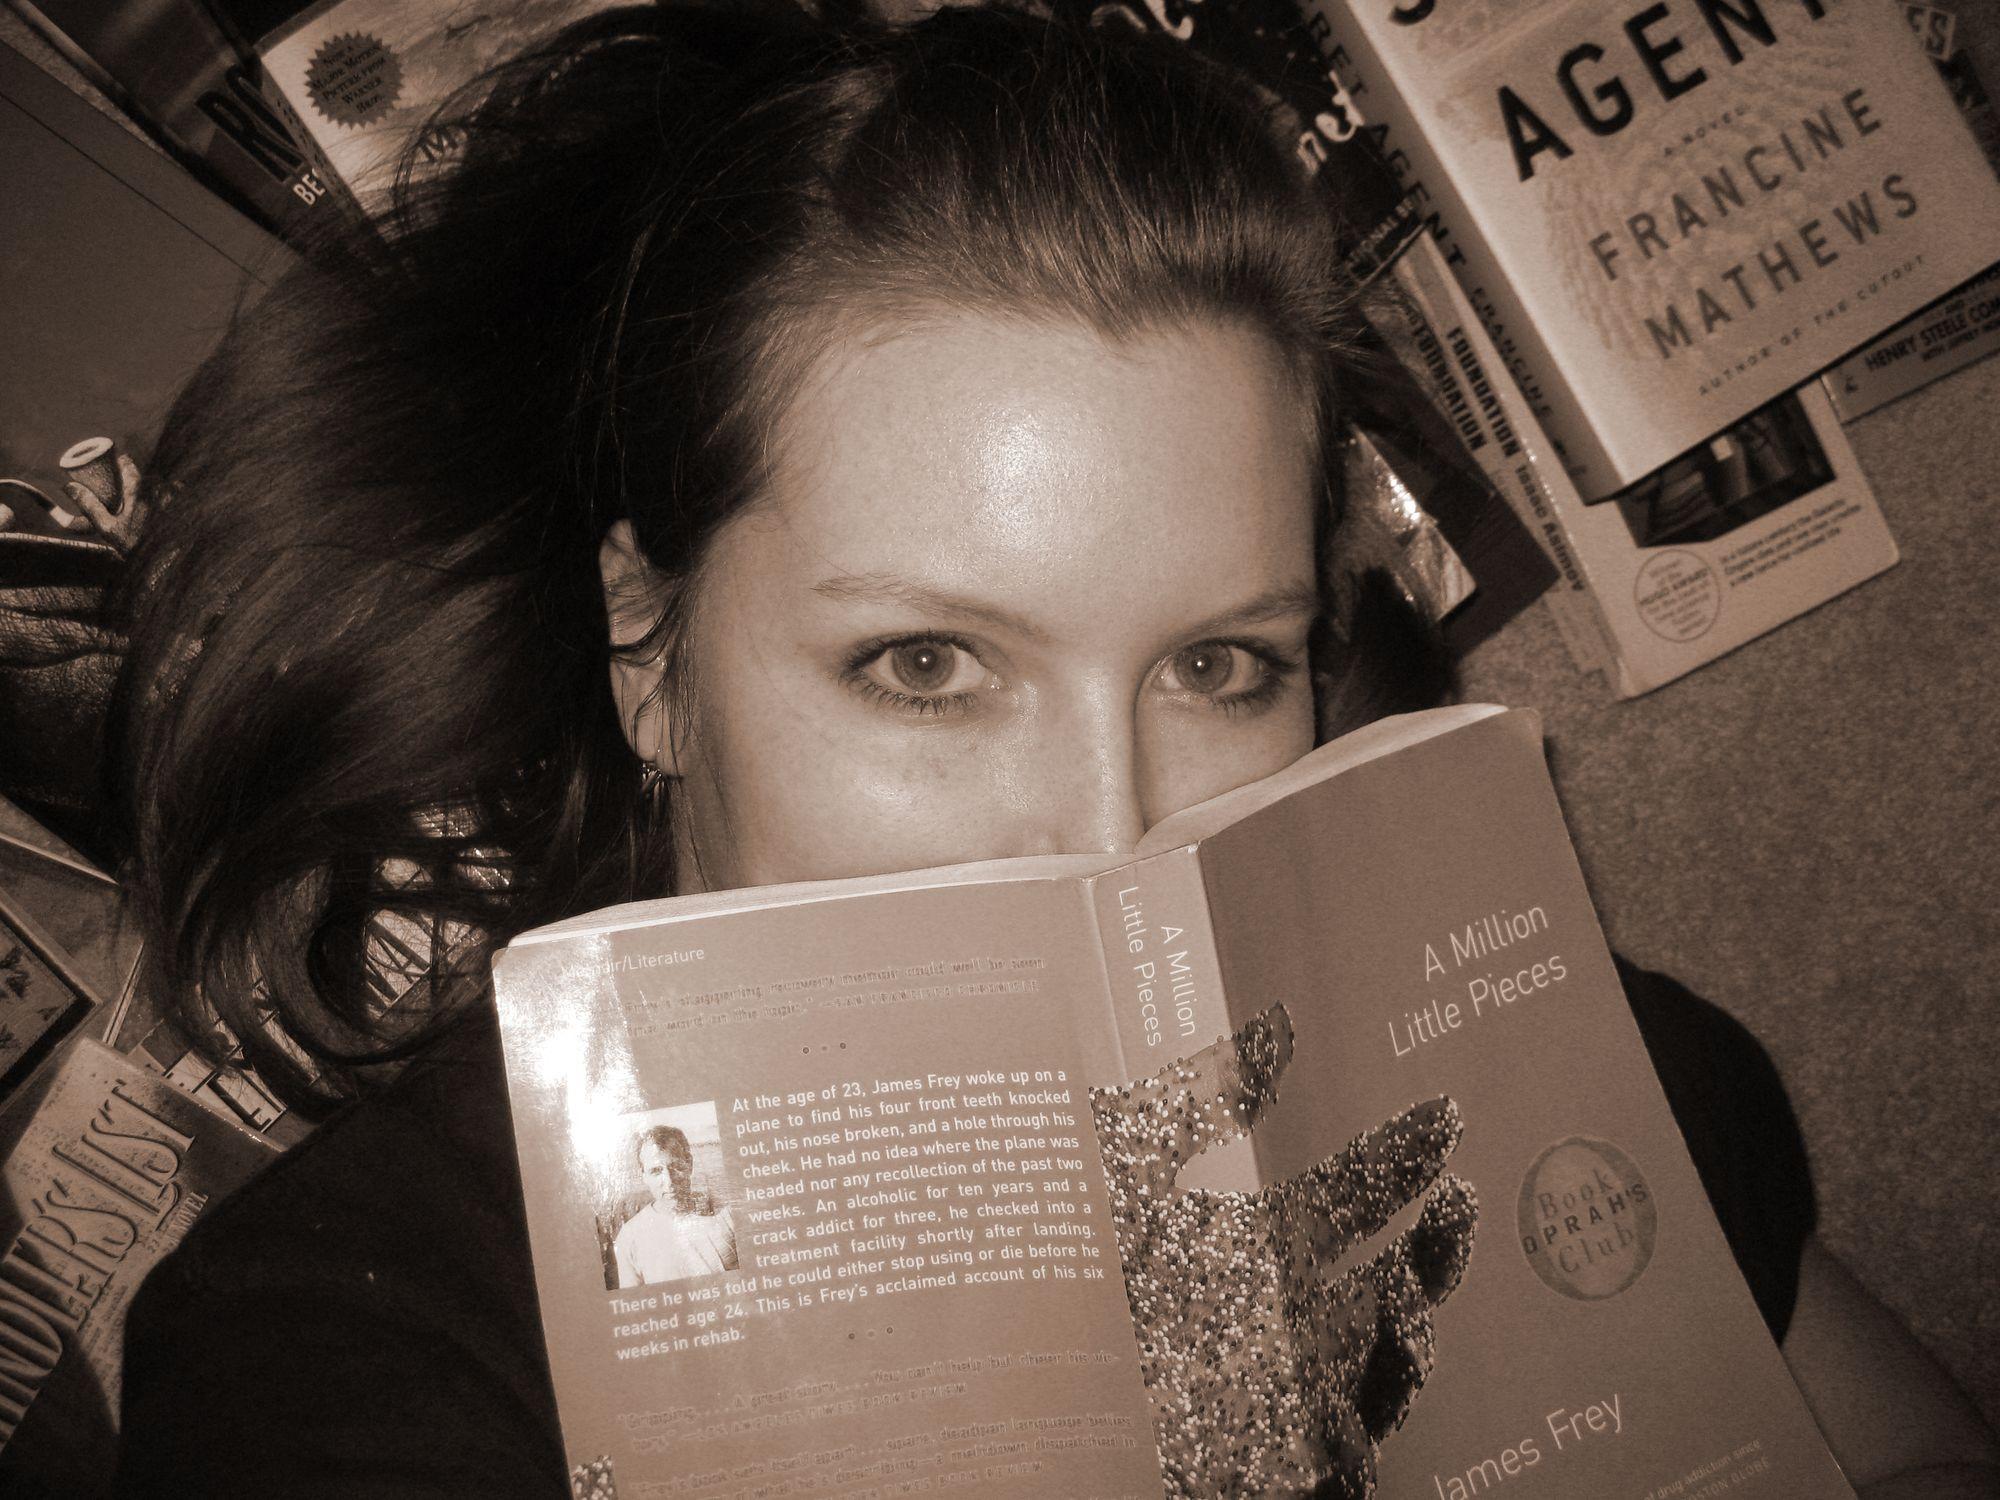 Literacy, FTW!